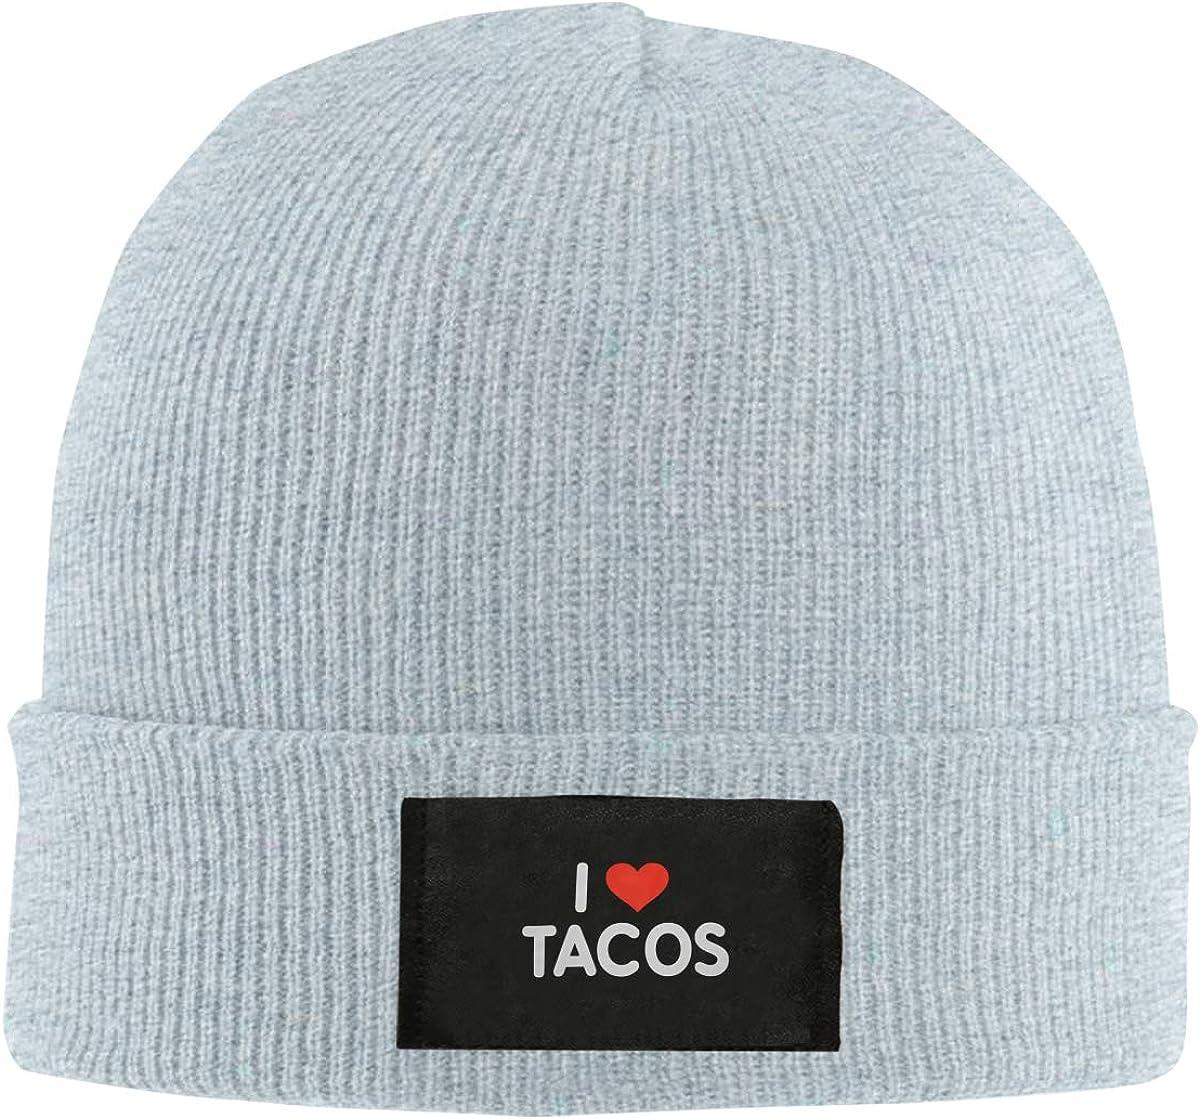 Unisex Stylish Slouch Beanie Hats Black I Love Tacos Top Level Beanie Men Women